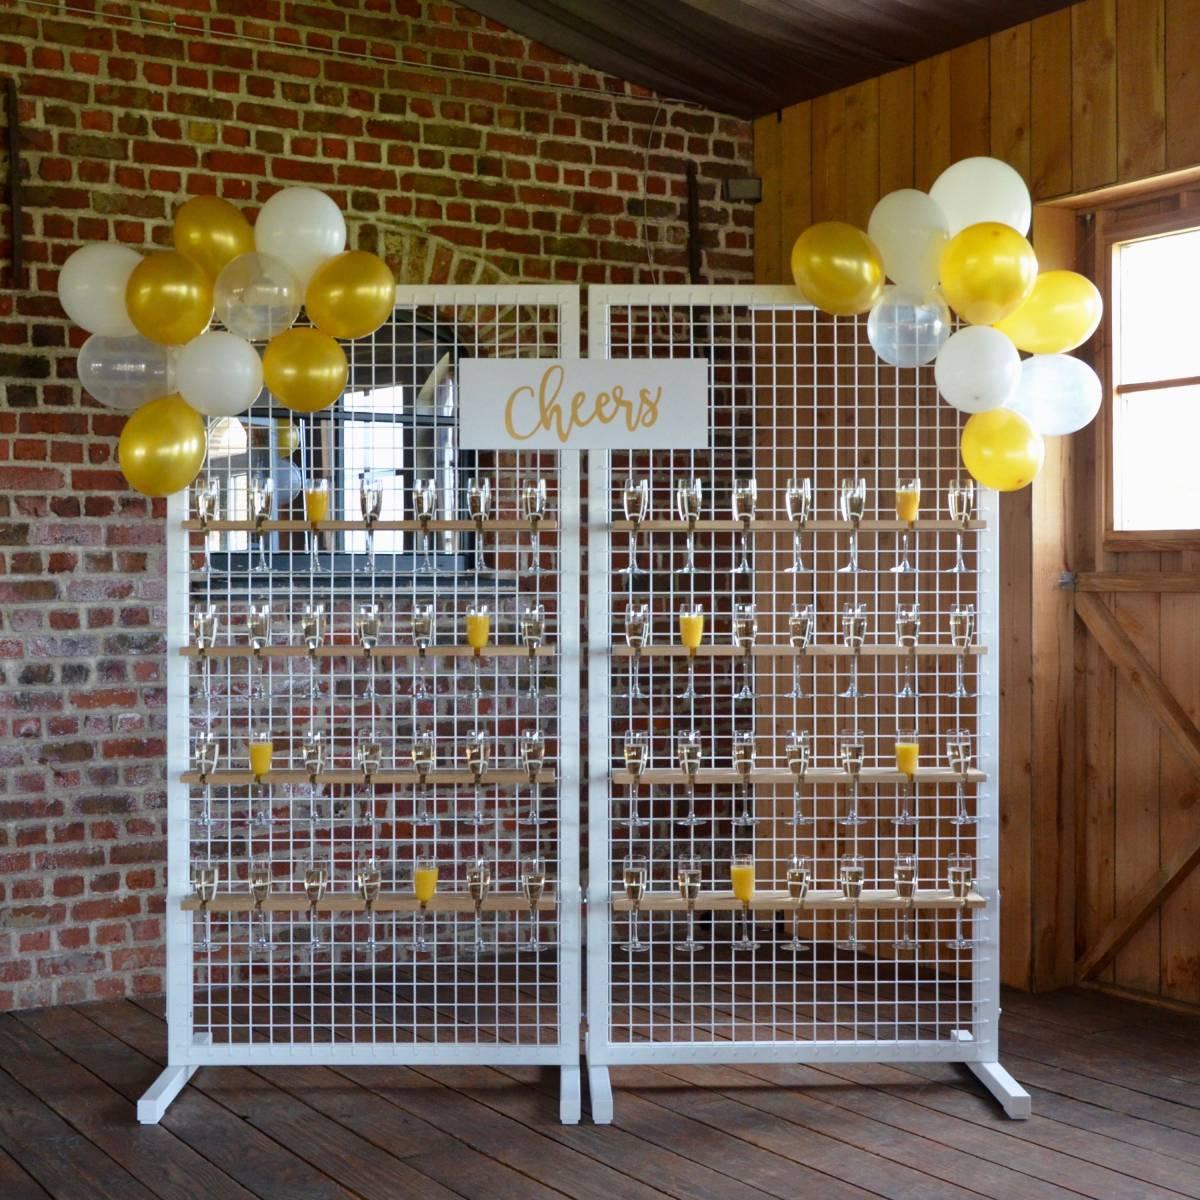 XtraLetter - Decoratie - Foto's zelf gemaakt - Feestzaal Domein 't Eikennest - House of Weddings - 4